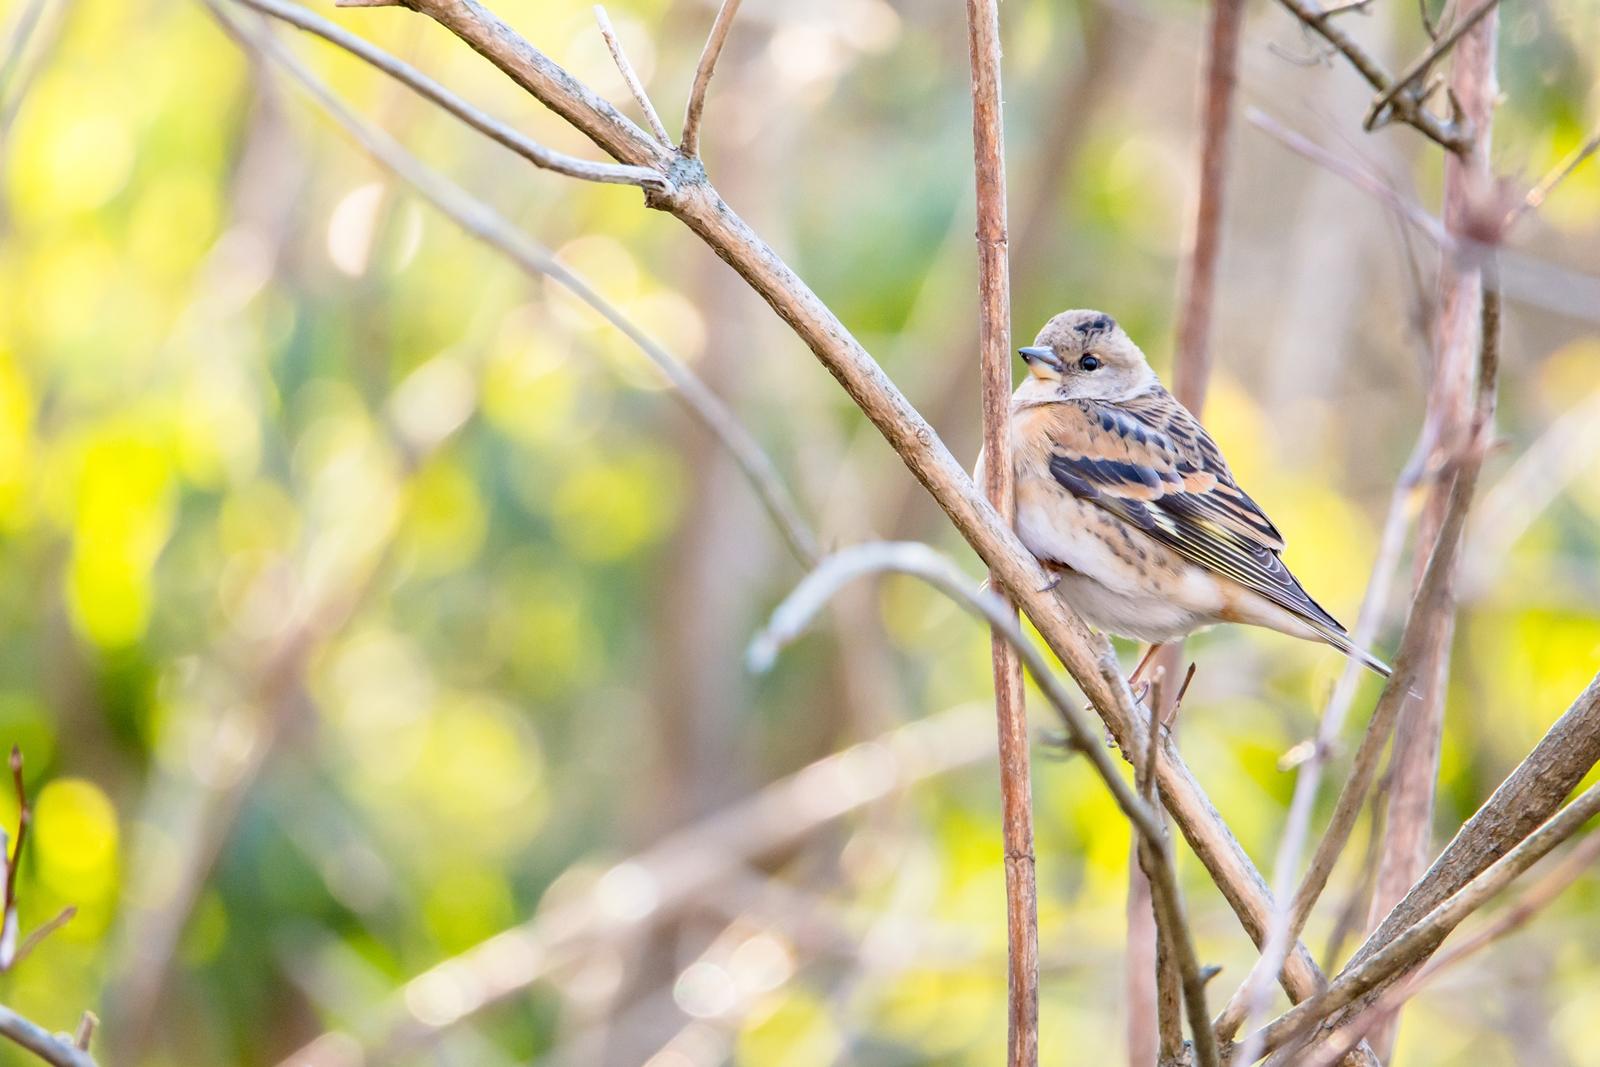 Photo: 安らかな光 Restful sunlight.  まだまだ寒いけど でも知っている もう少しでここも 芽吹き輝き騒がしくなる 安らかな光が教えてくれる  Brambling. (アトリ) #cooljapan #365cooljapanmay  #birdphotography #birds #kawaii  #sigma  Nikon D7100 SIGMA 150-600mm F5-6.3 DG OS HSM Sports [ Day263, January 30th ] (2枚追加:Added 2 photo)  小鳥の詩朗読 http://youtu.be/QptVuE3LQZQ?list=PL2YtHGm0-R3qVsaqvQe9OYdJFCkI98wzF